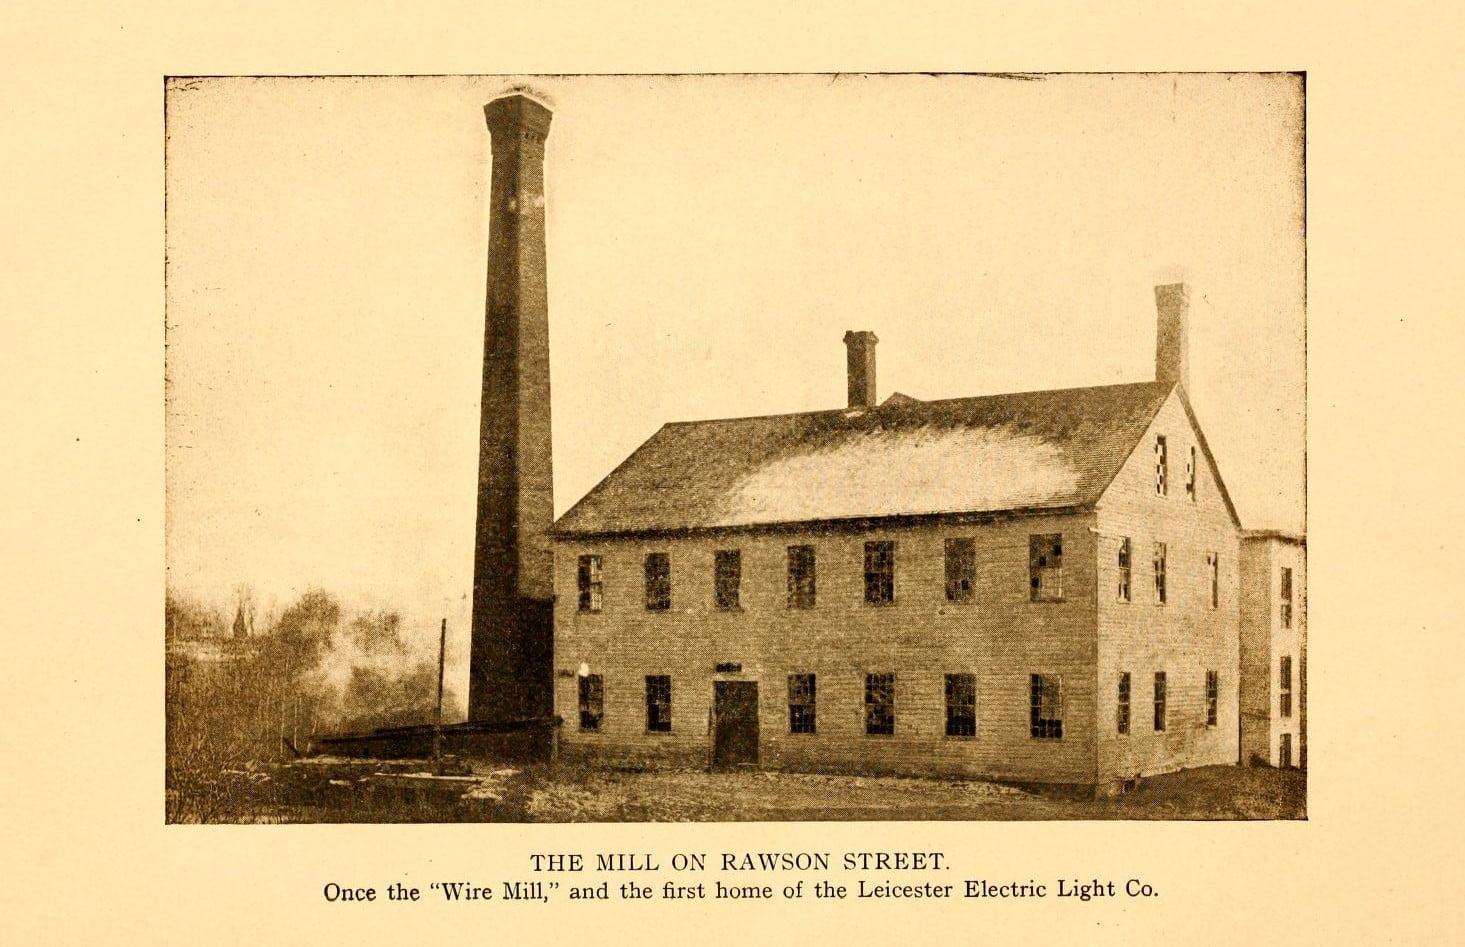 The Mill on Rawson Street